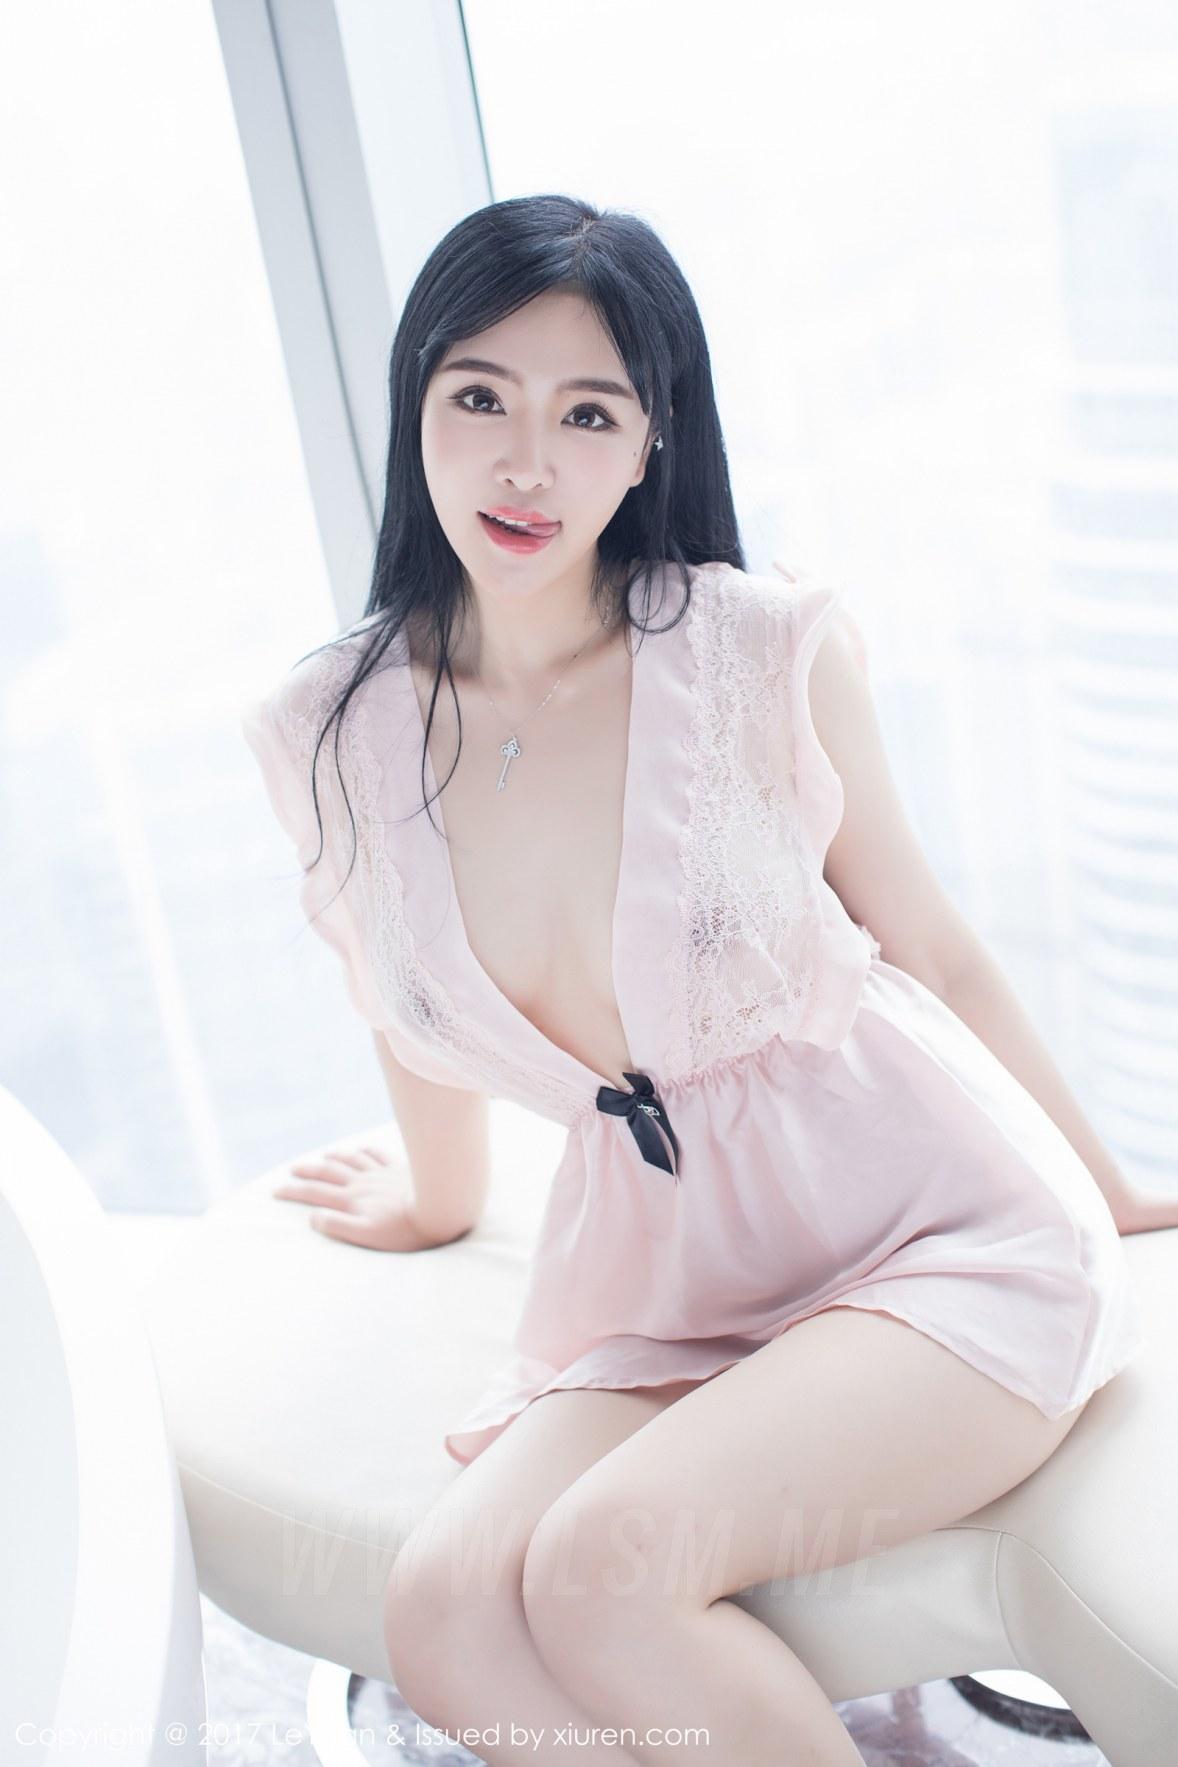 LeYuan 星乐园 Vol.046 Modo 刘钰儿 - 4